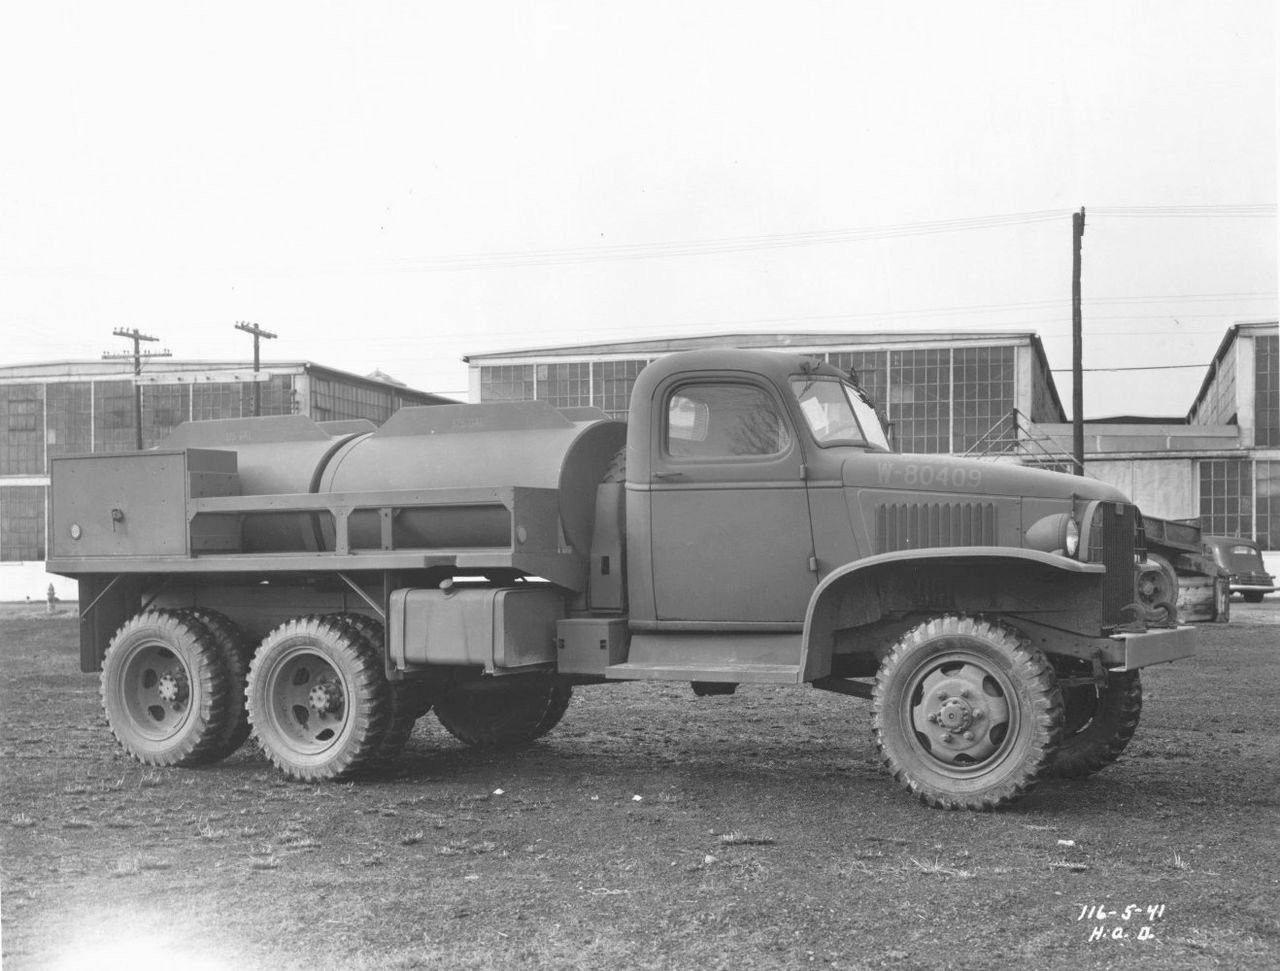 Tanker Gmc 750 Gallons 2 1 2 Tons 6x6 6x6 Truck Fuel Truck